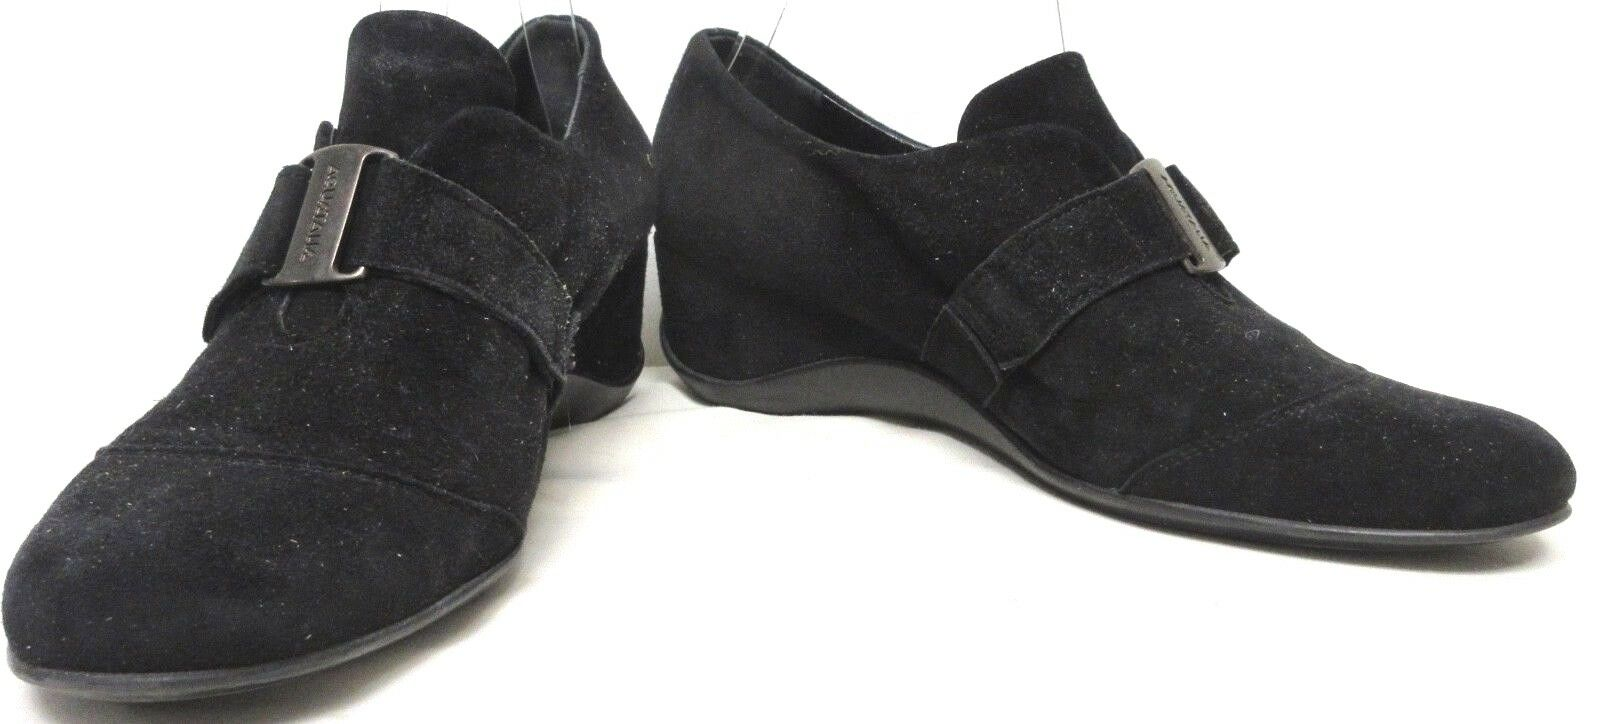 AQUATALIA SPORT CASUAL SHOES WEDGE HEEL BLACK SUEDE SLIP ON W ADJUSTABLE SZ 39